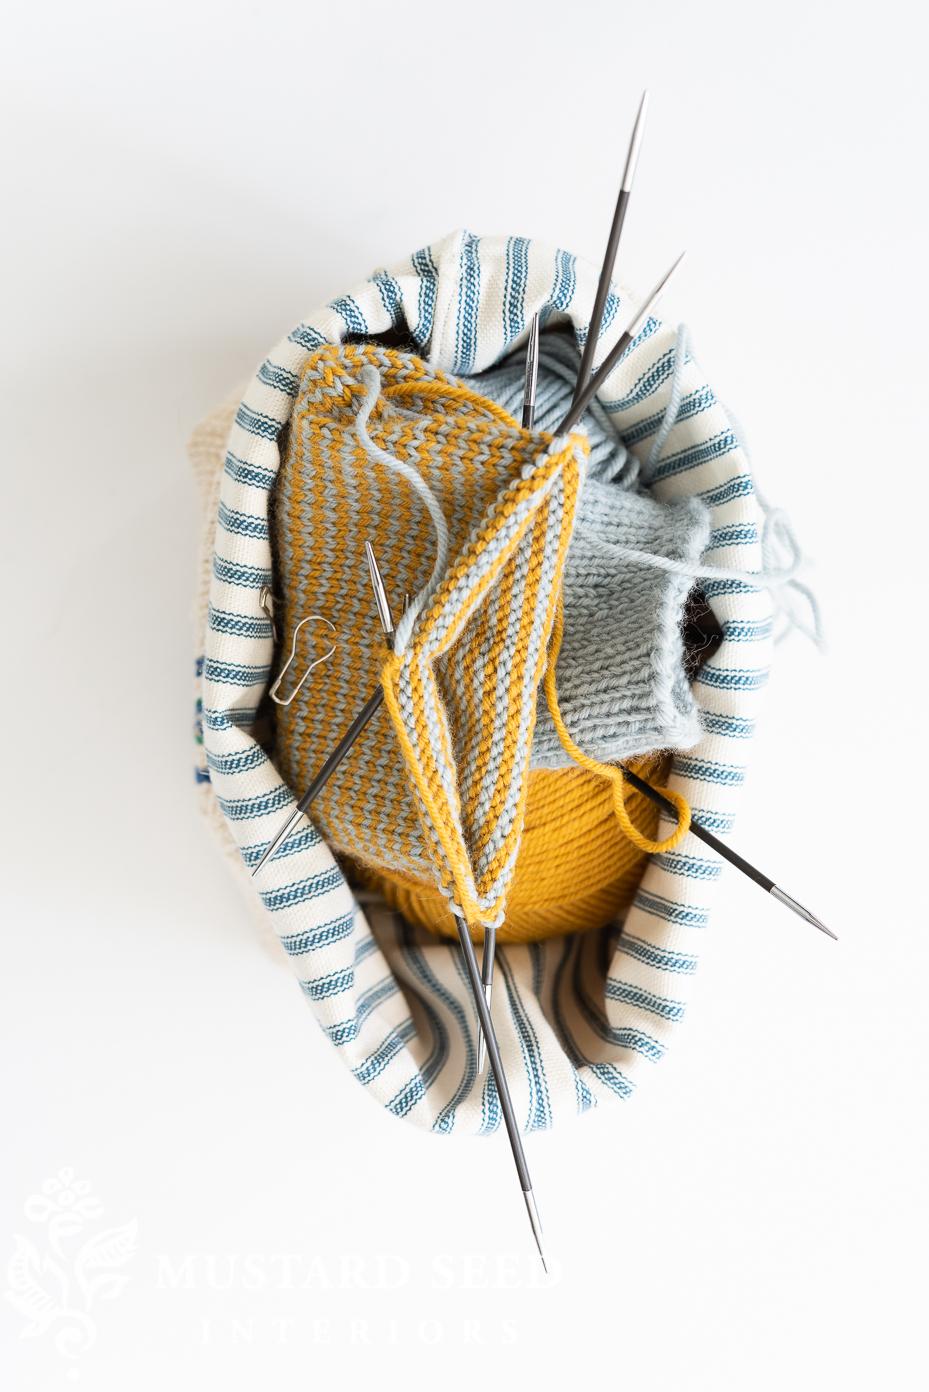 knitting socks | project bag | miss mustard seed